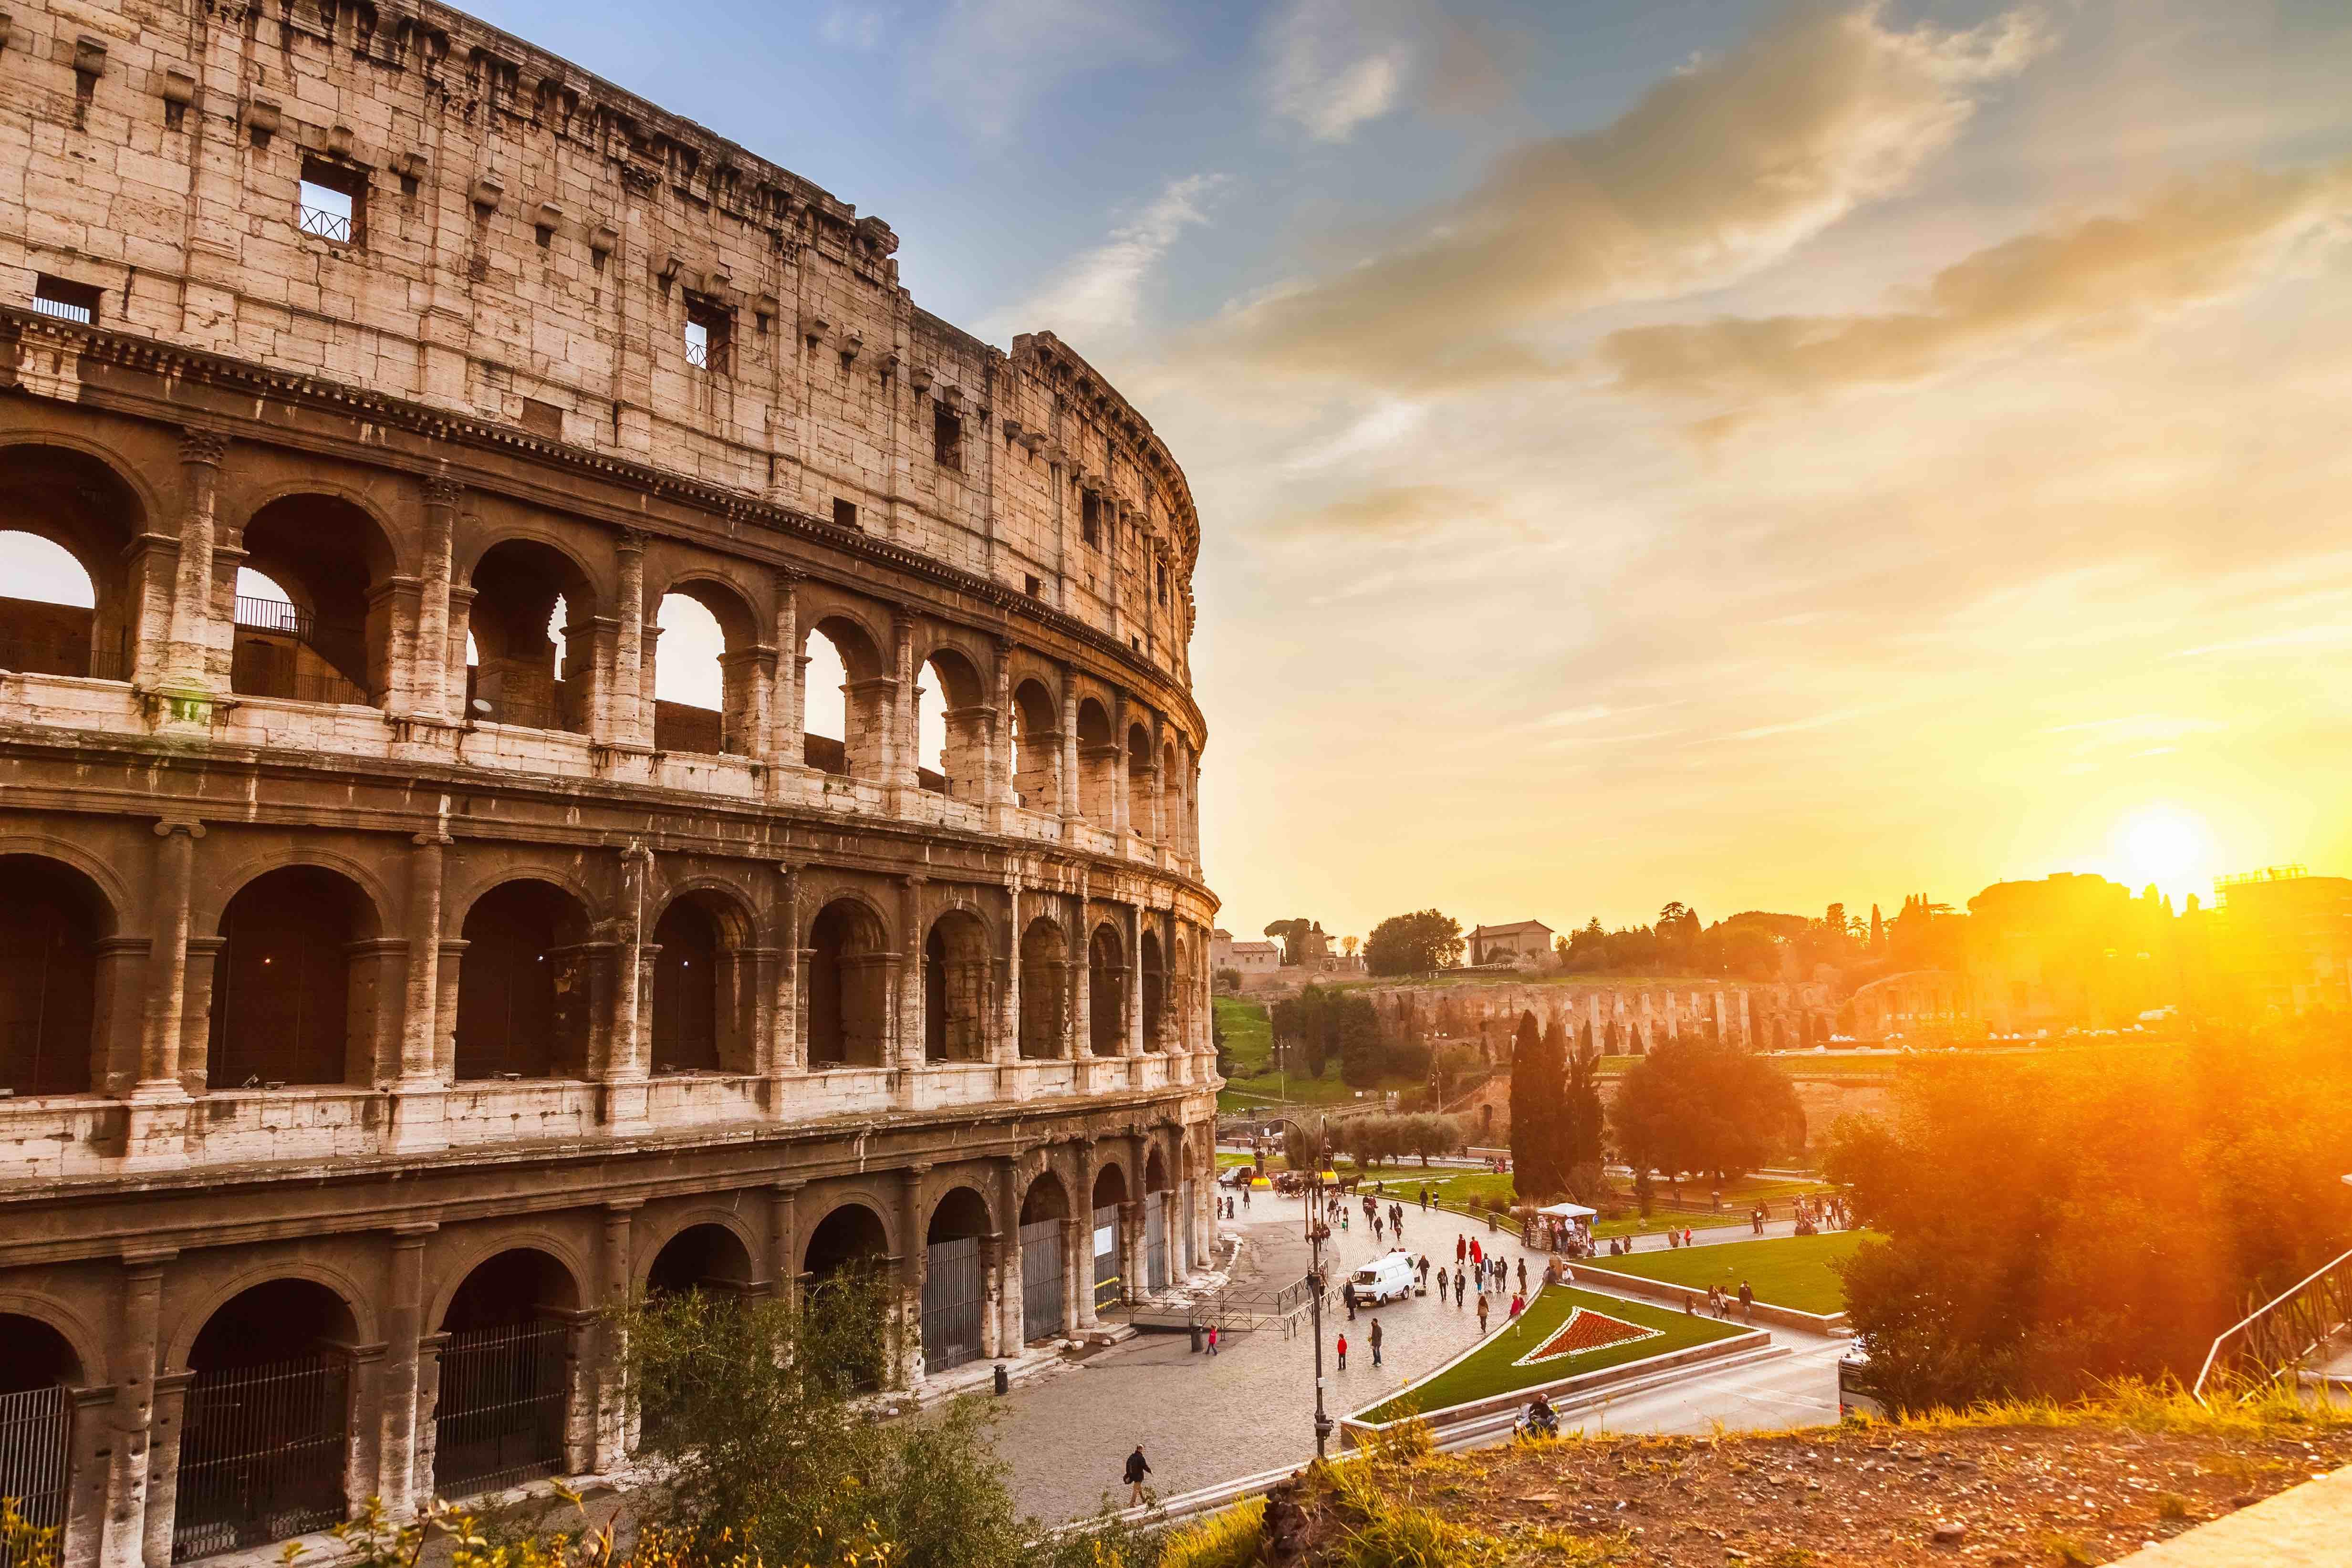 La Dolce Vita of Italy